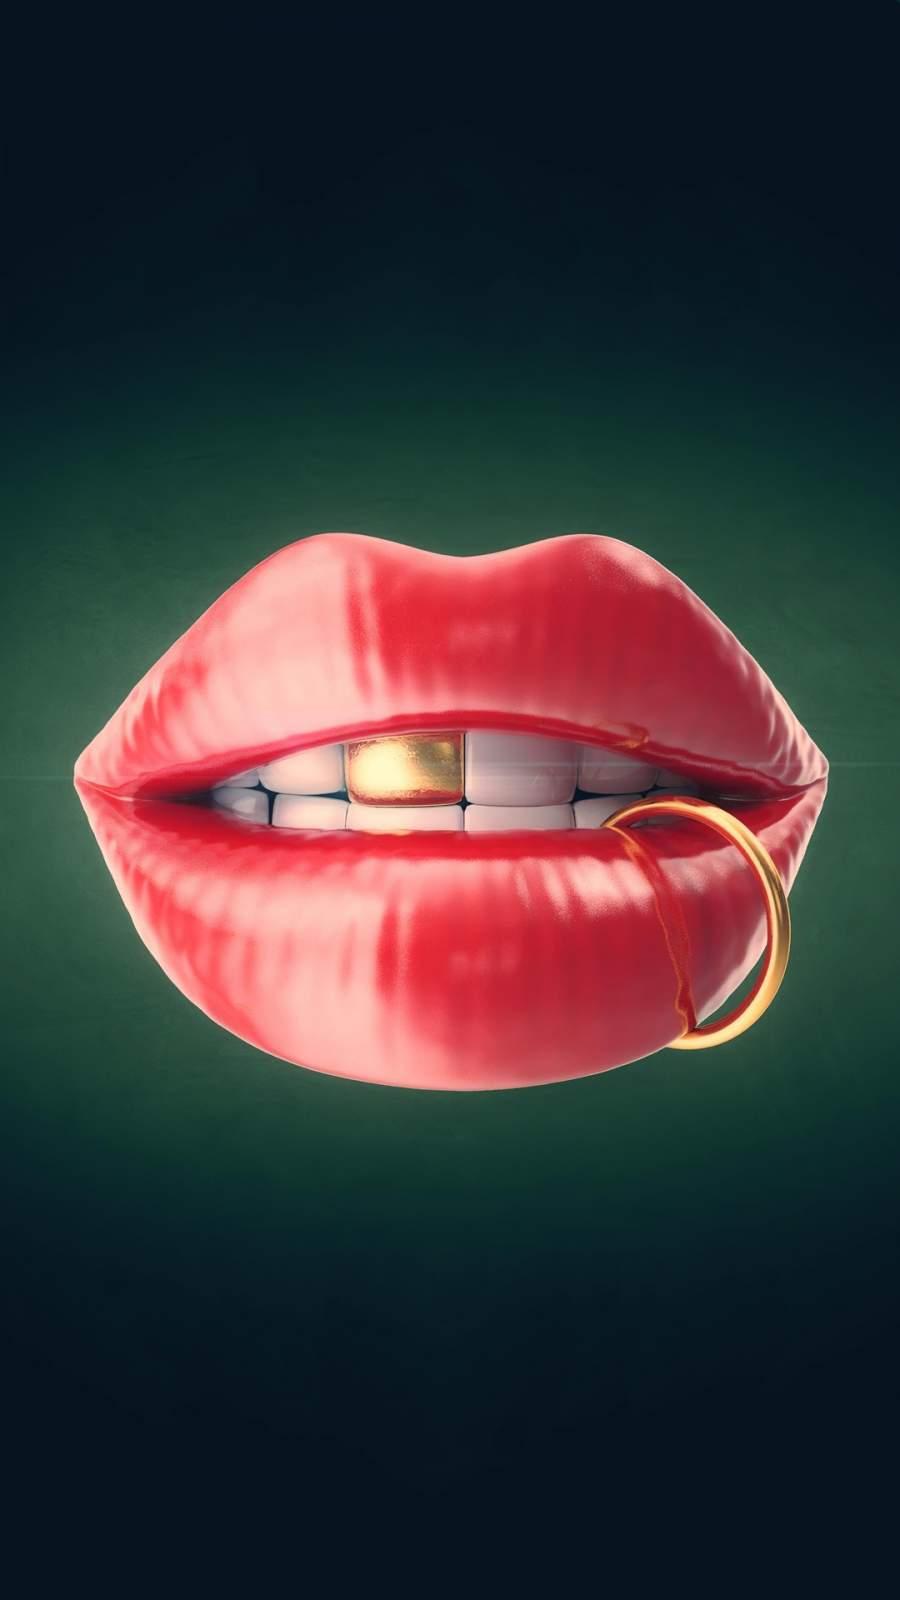 Lip Art iPhone Wallpaper